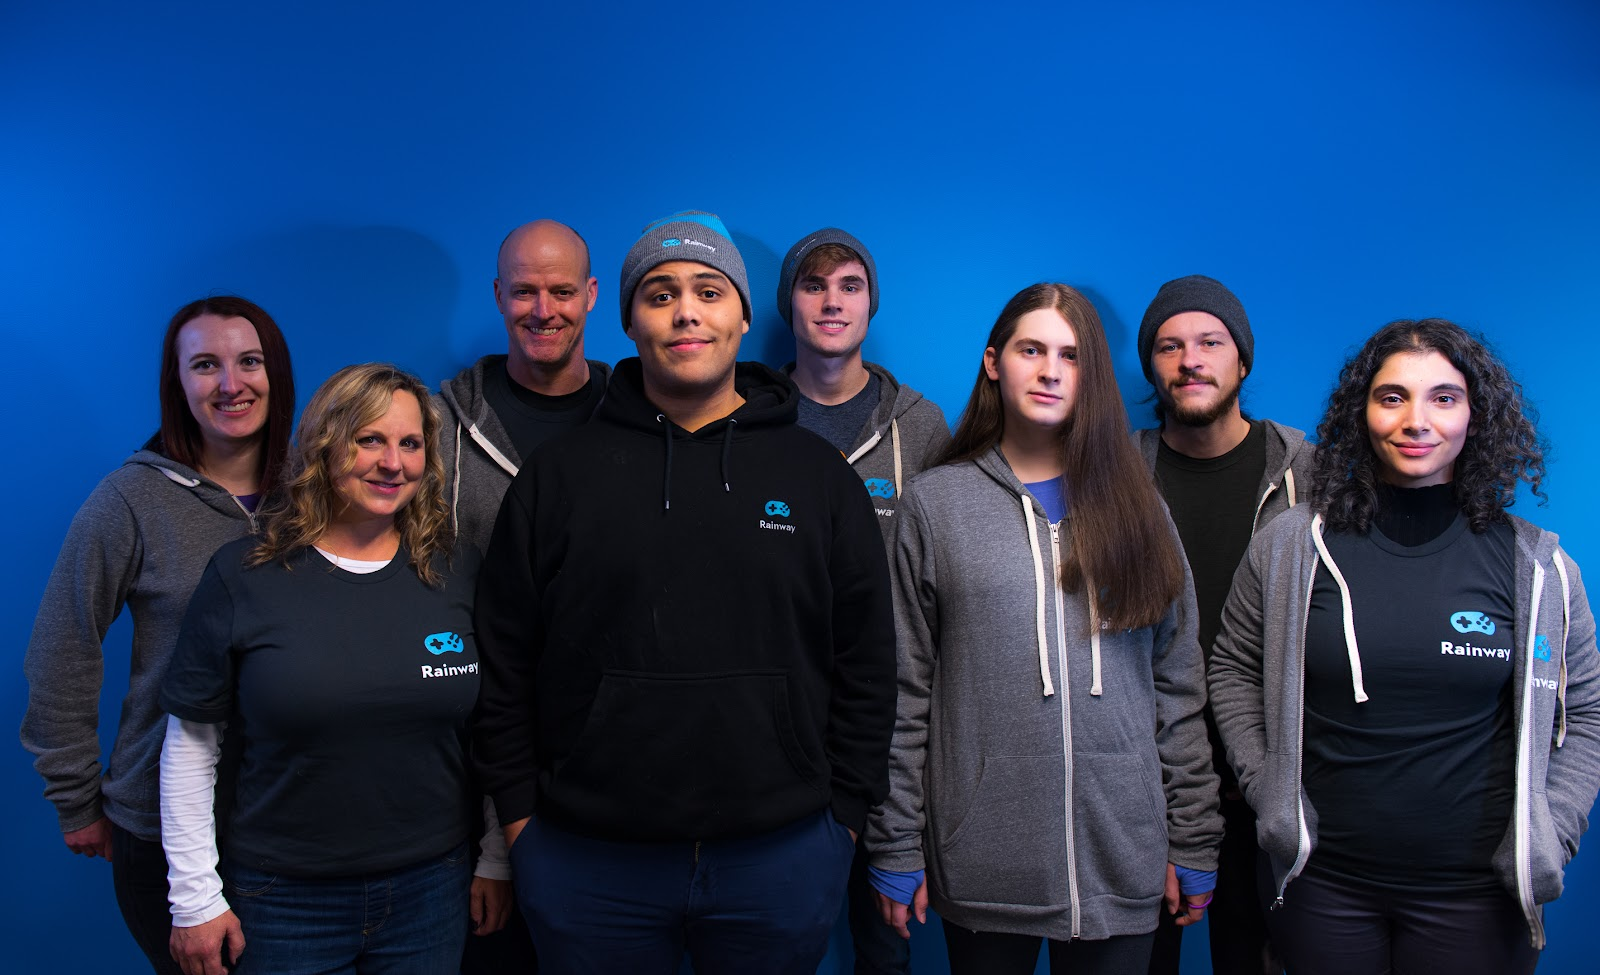 Rainway team photo